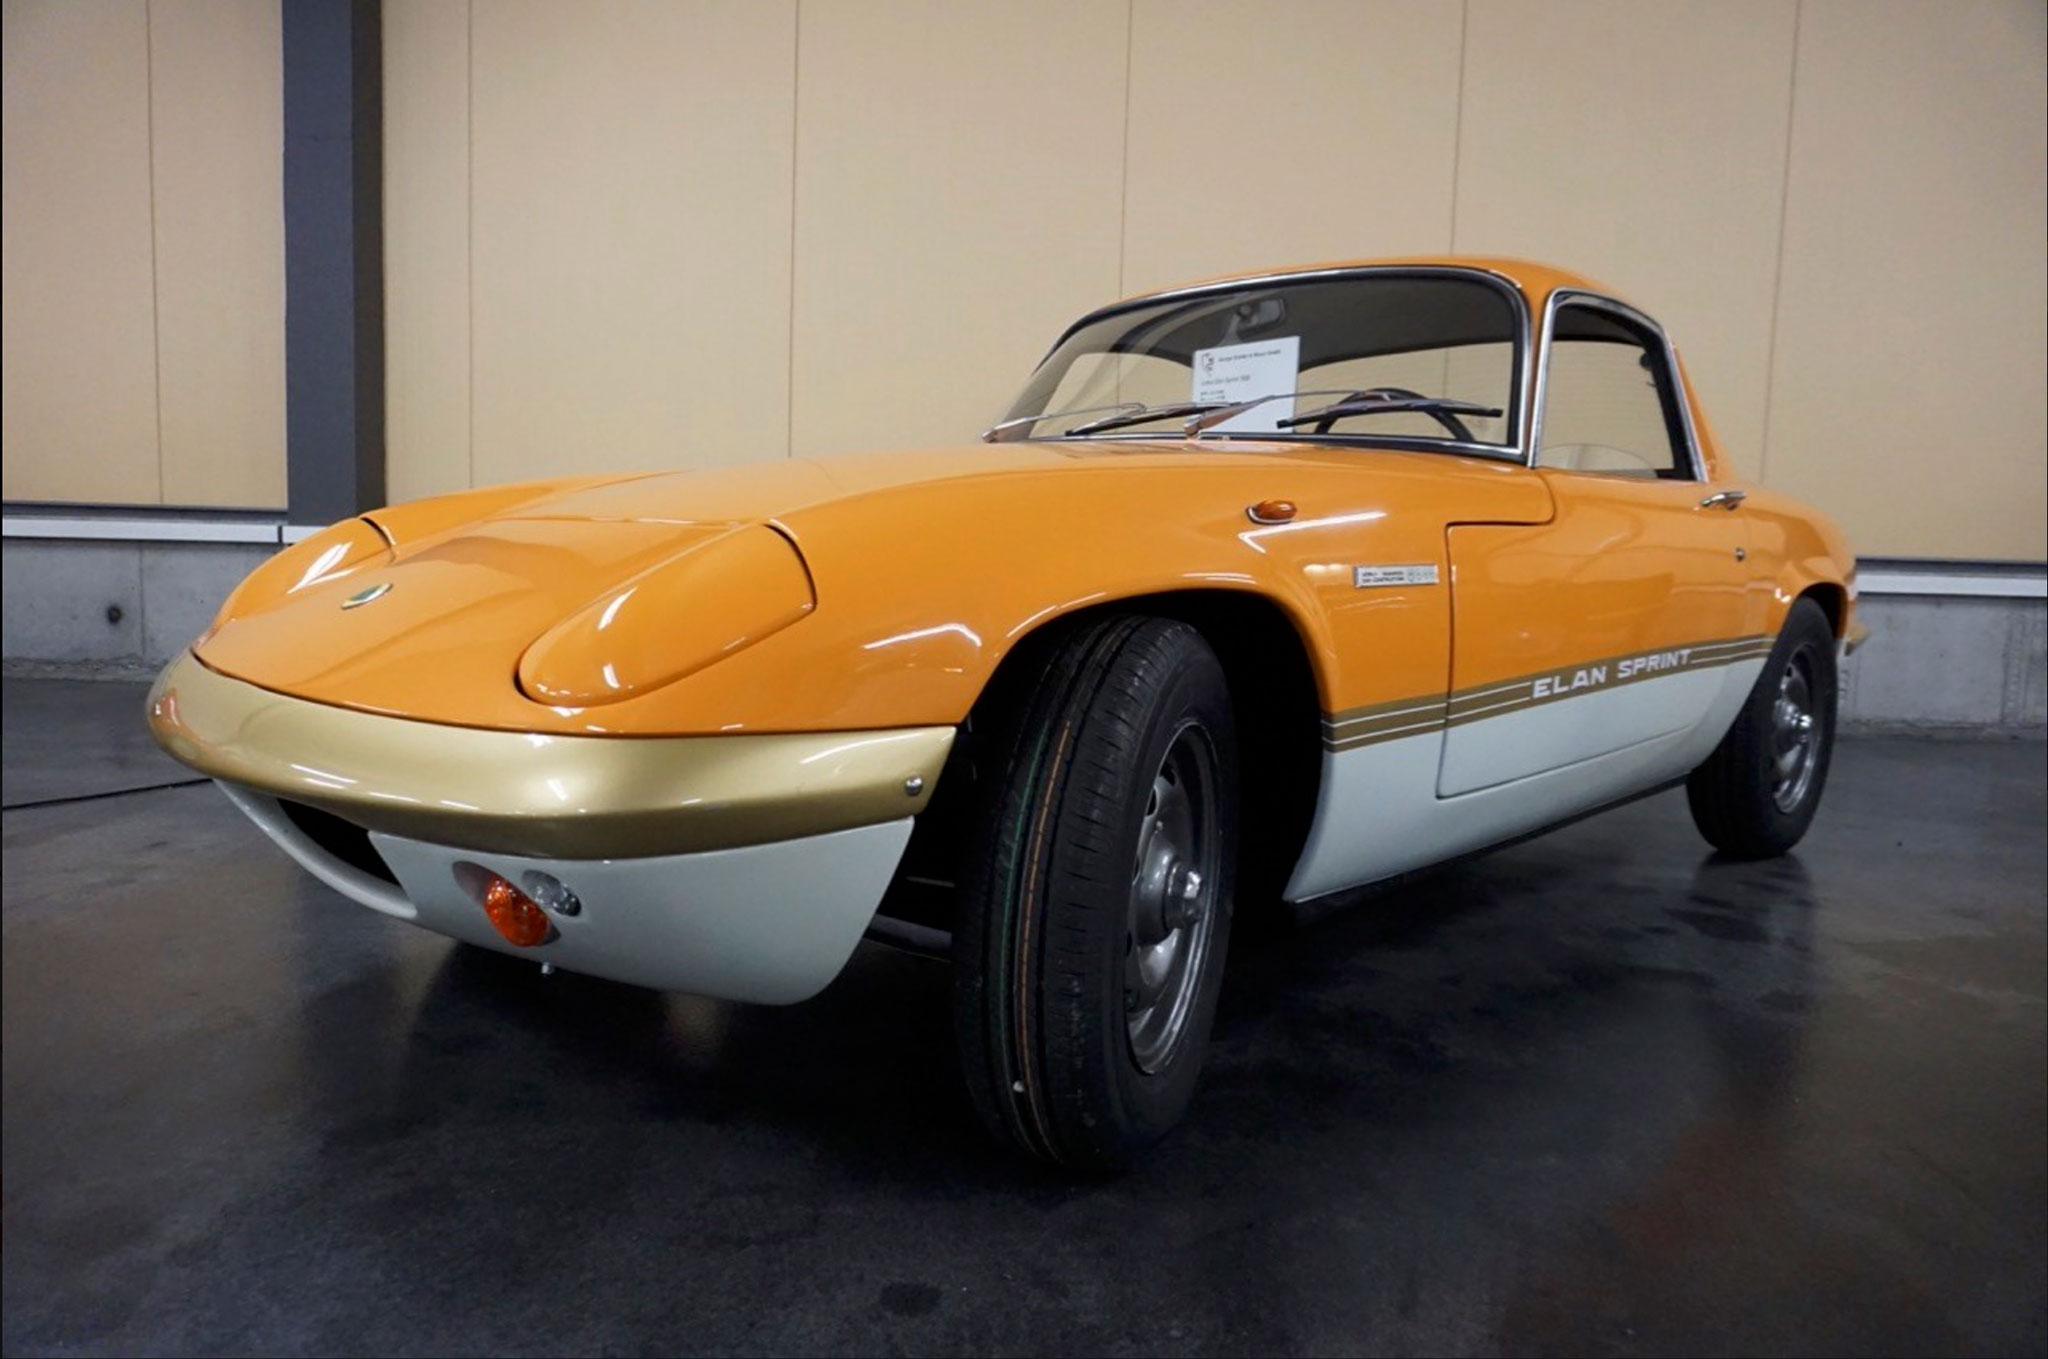 1975 Lotus Elan Sprint Coupé restauration à terminer CHF 42 000.